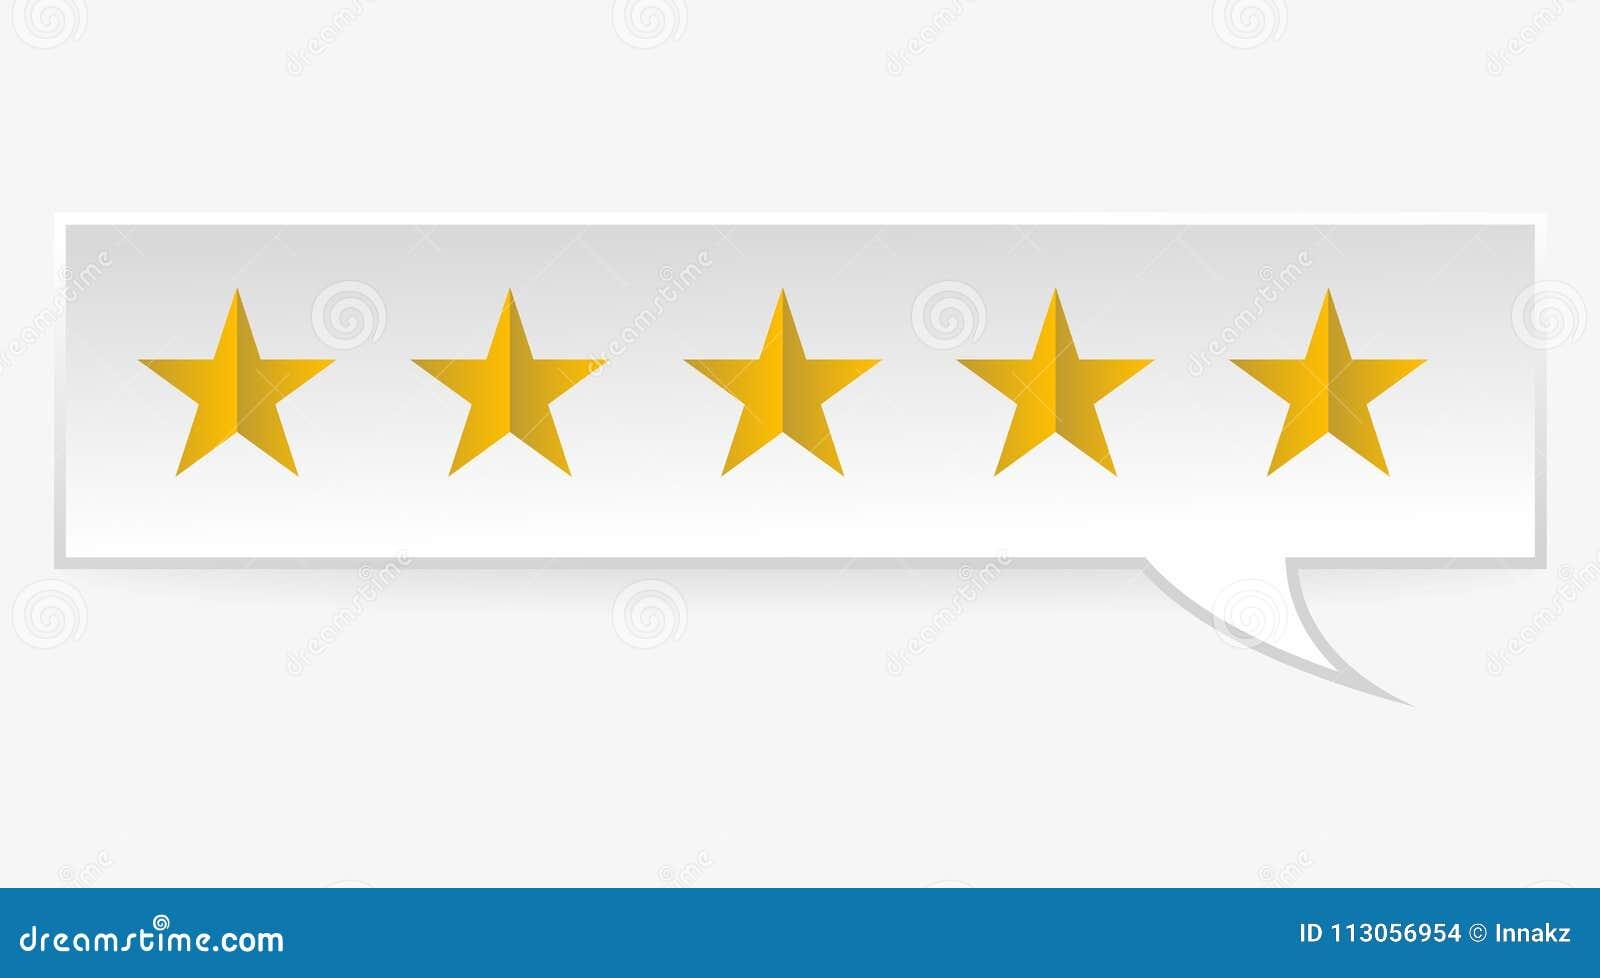 Rating Rank Stars Symbols Stock Vector Illustration Of First